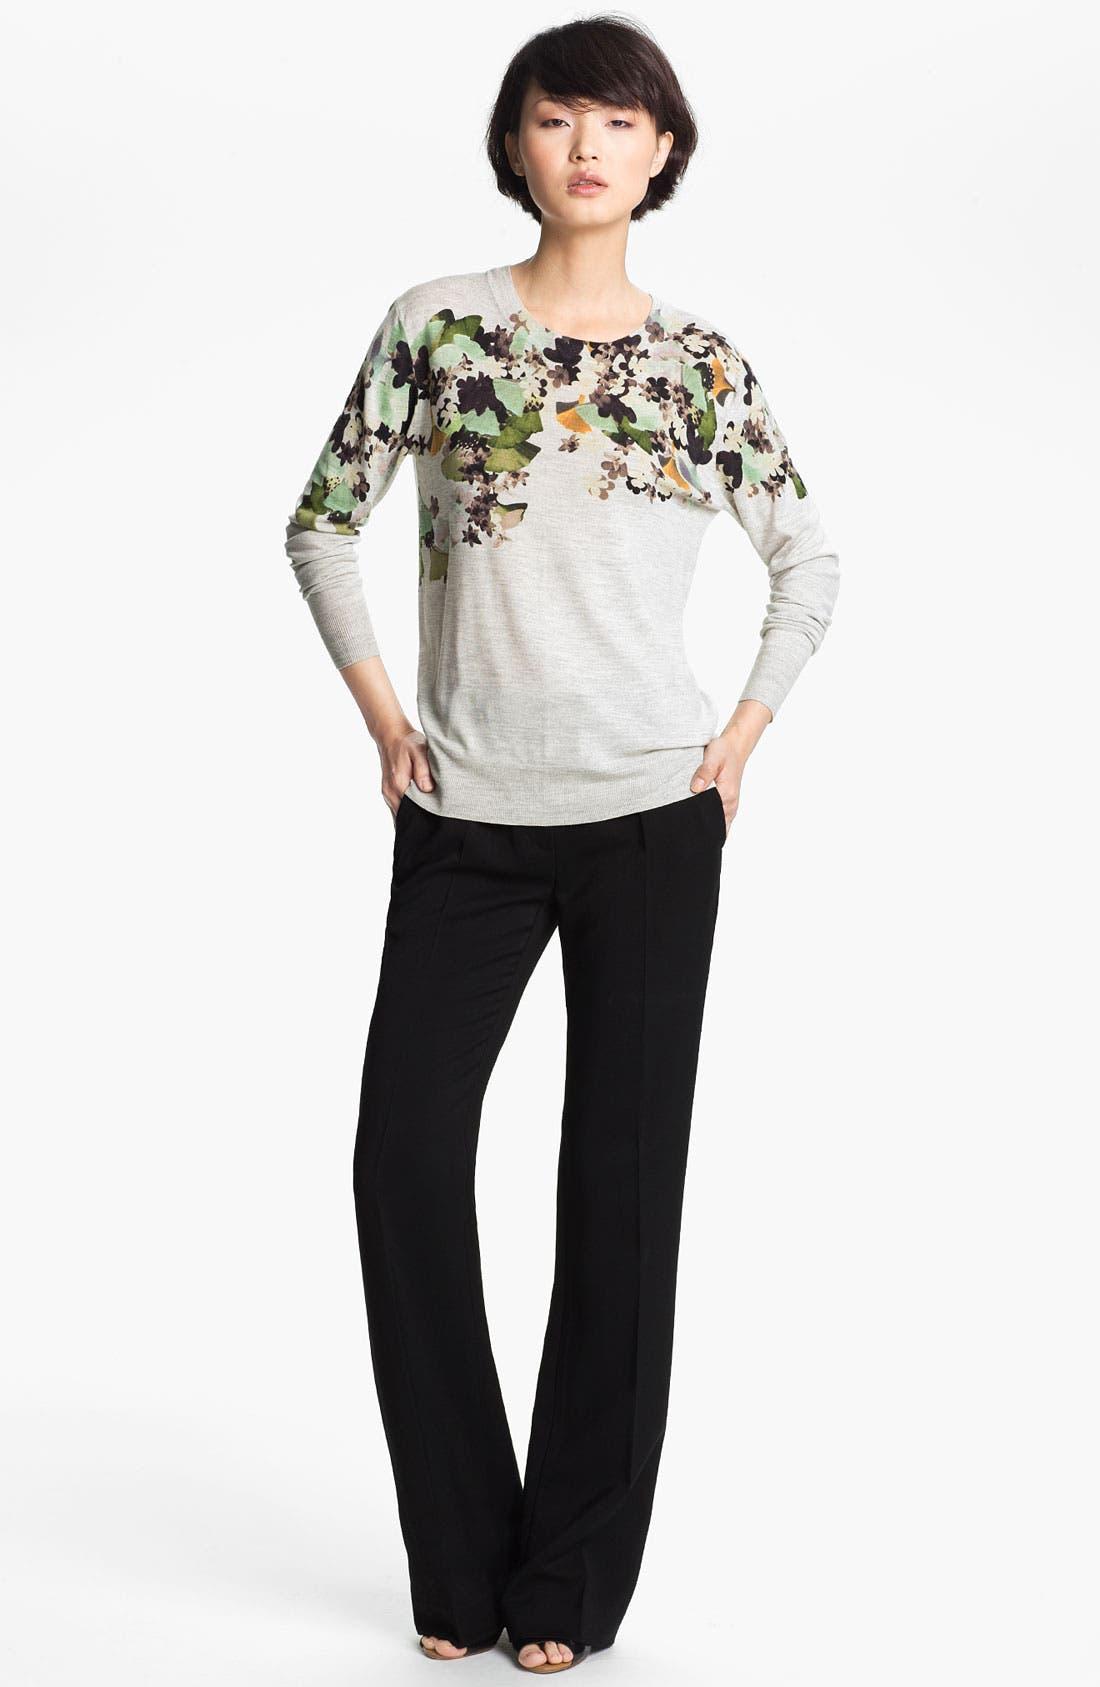 Alternate Image 1 Selected - 3.1 Phillip Lim Floral Print Sweater